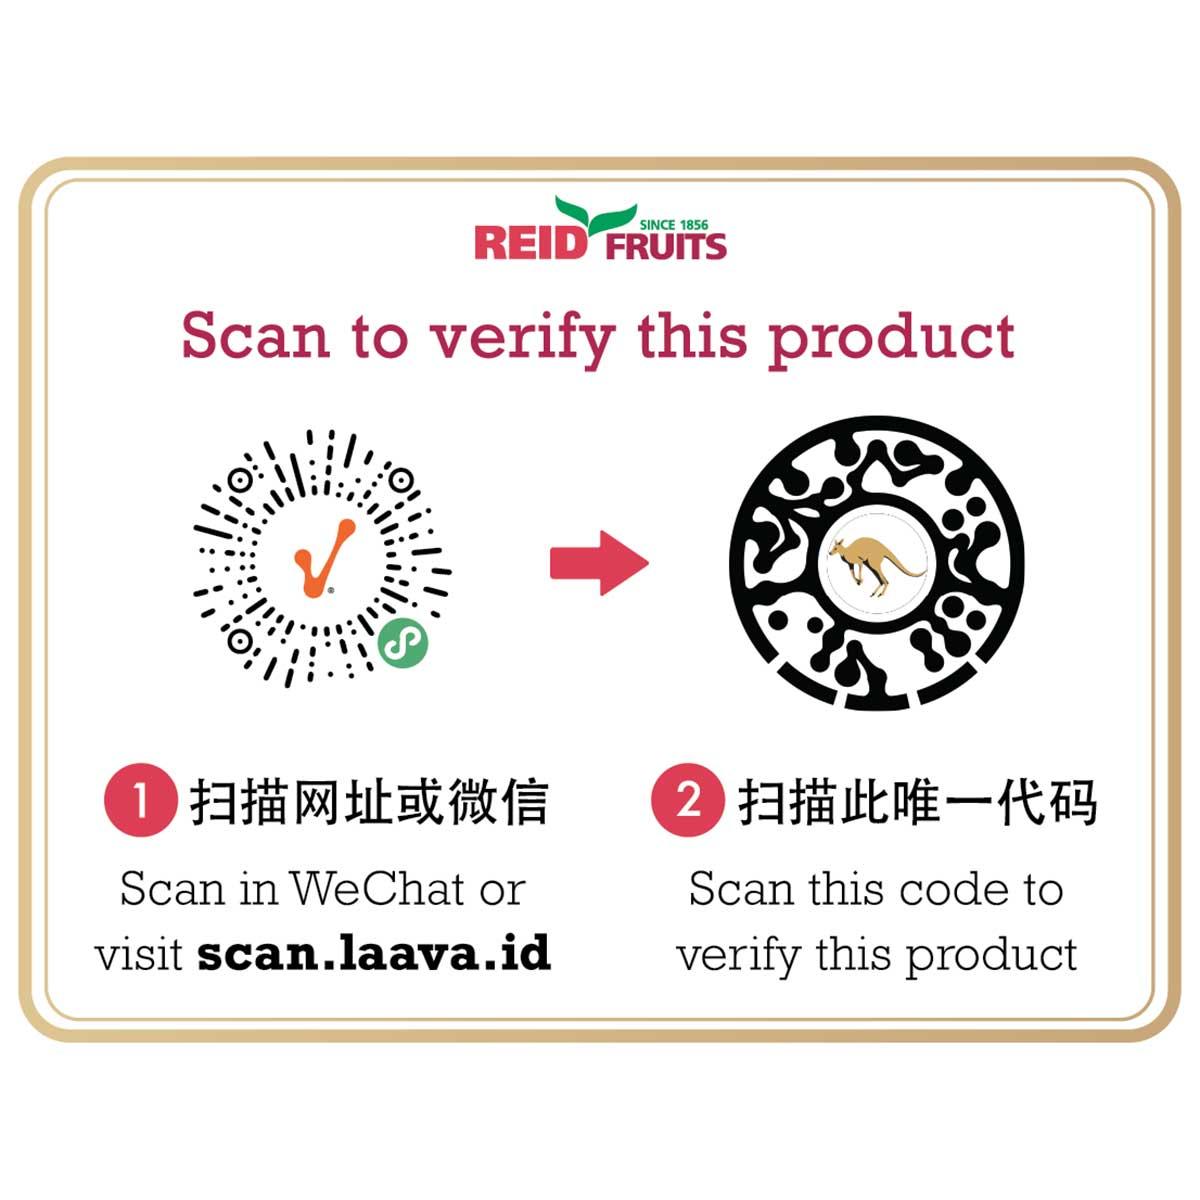 Laava Smart Fingerprints®, Reid Fruits